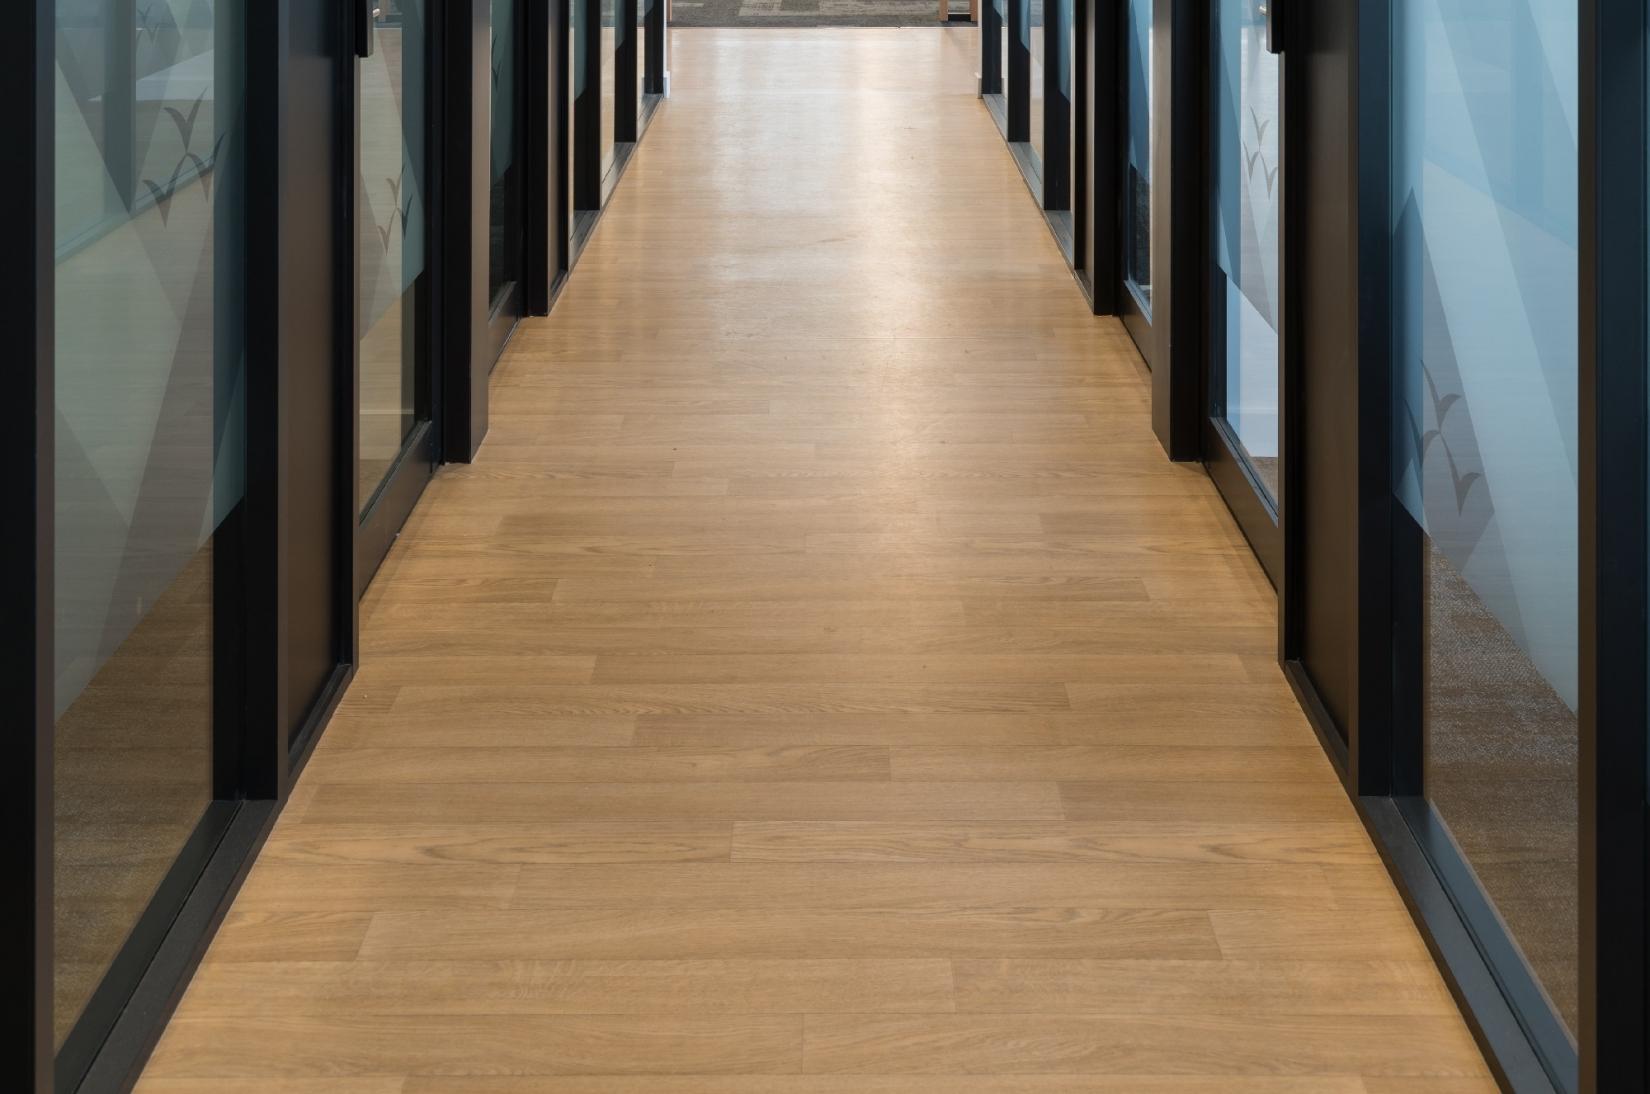 Taralay Initial Compact Vinyl Floor - Wood Look - MIT